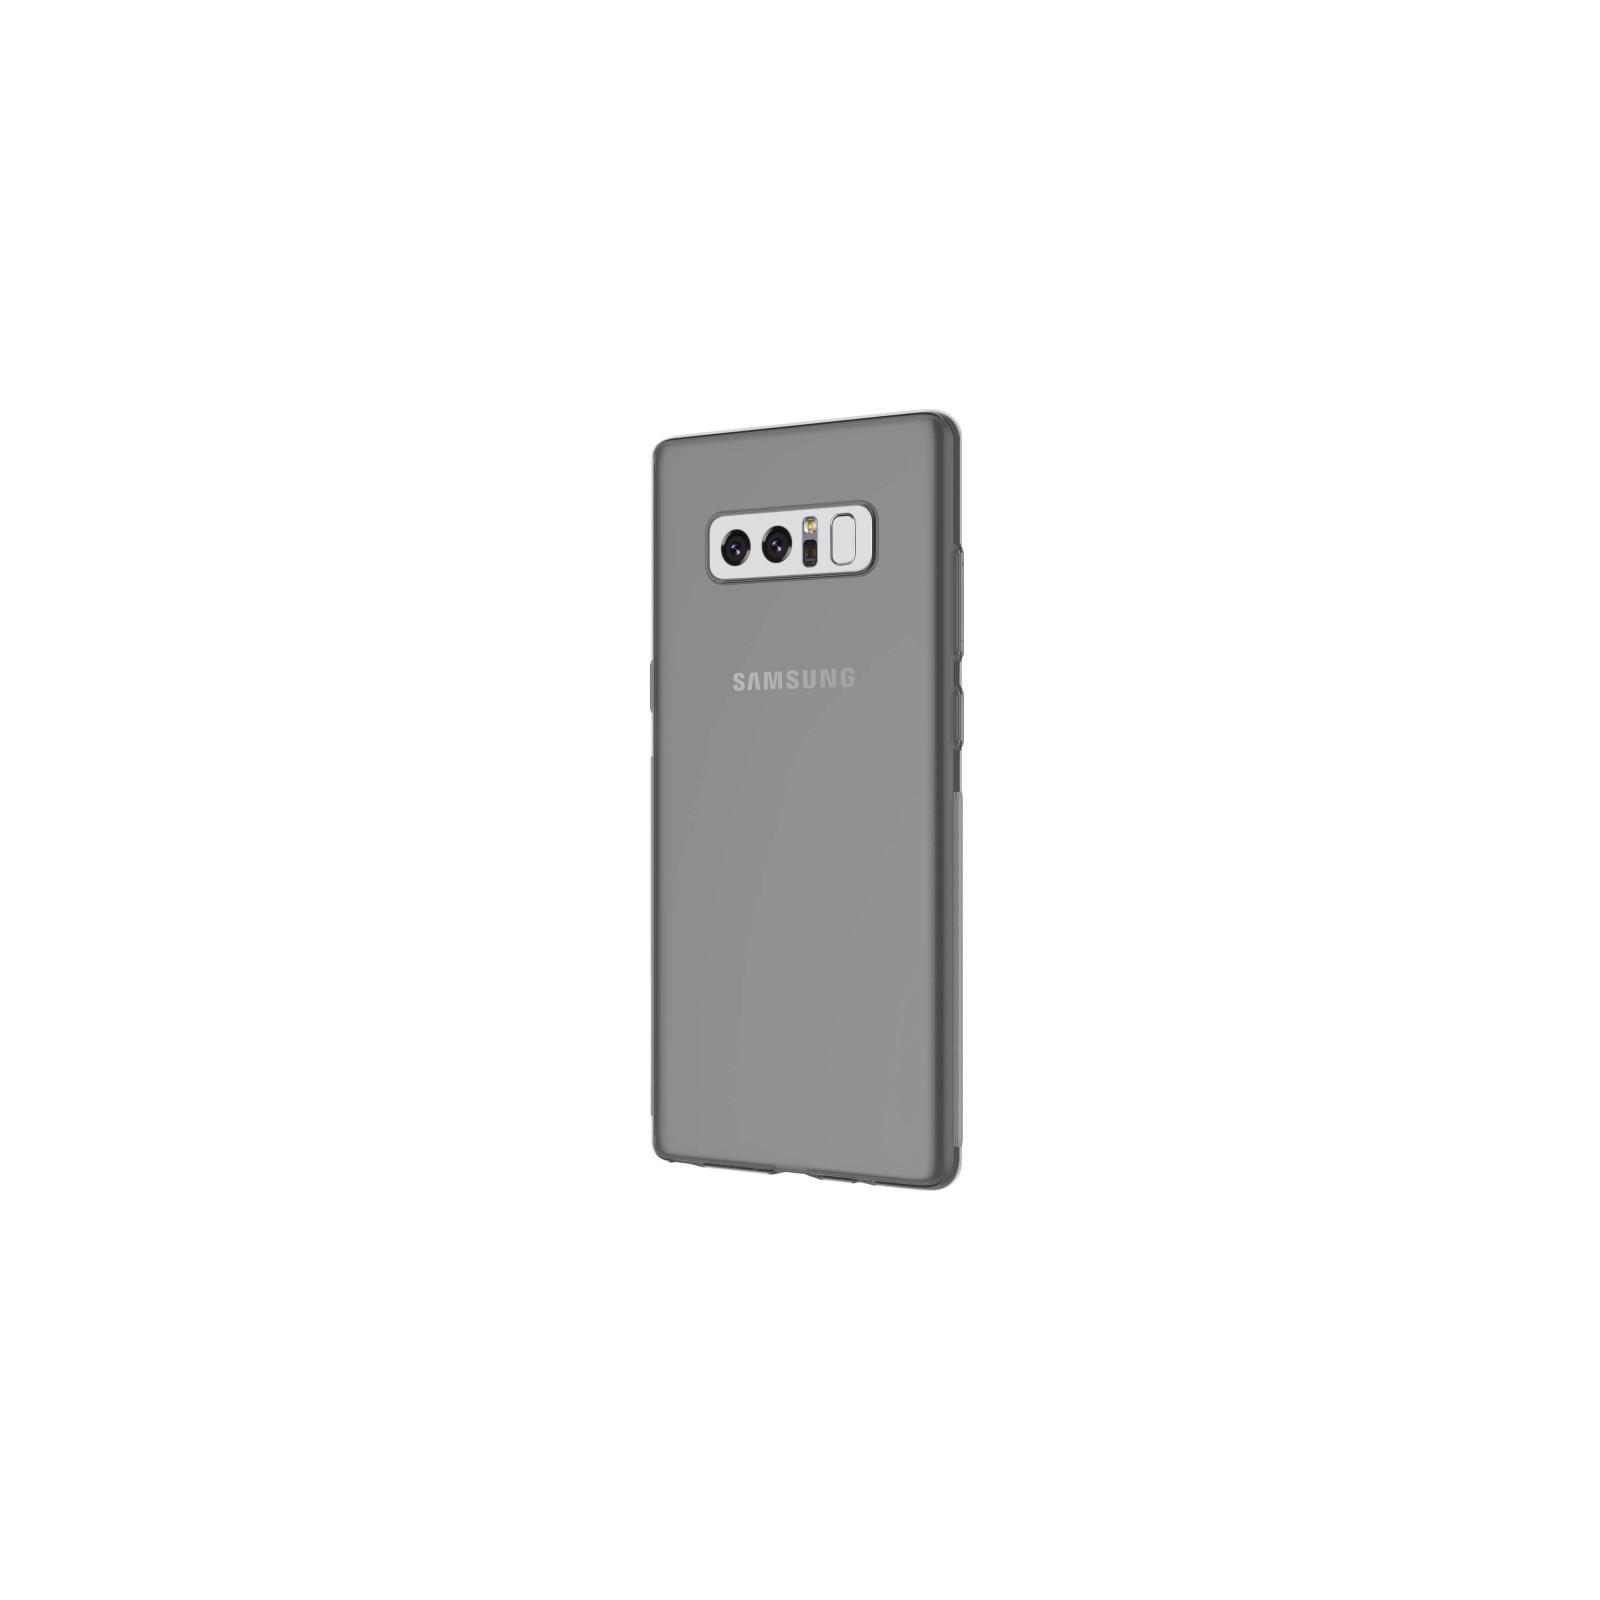 Чехол для моб. телефона SmartCase Samsung Galaxy Note 8 / SM-N950 TPU Clear (SC-GN8) изображение 4